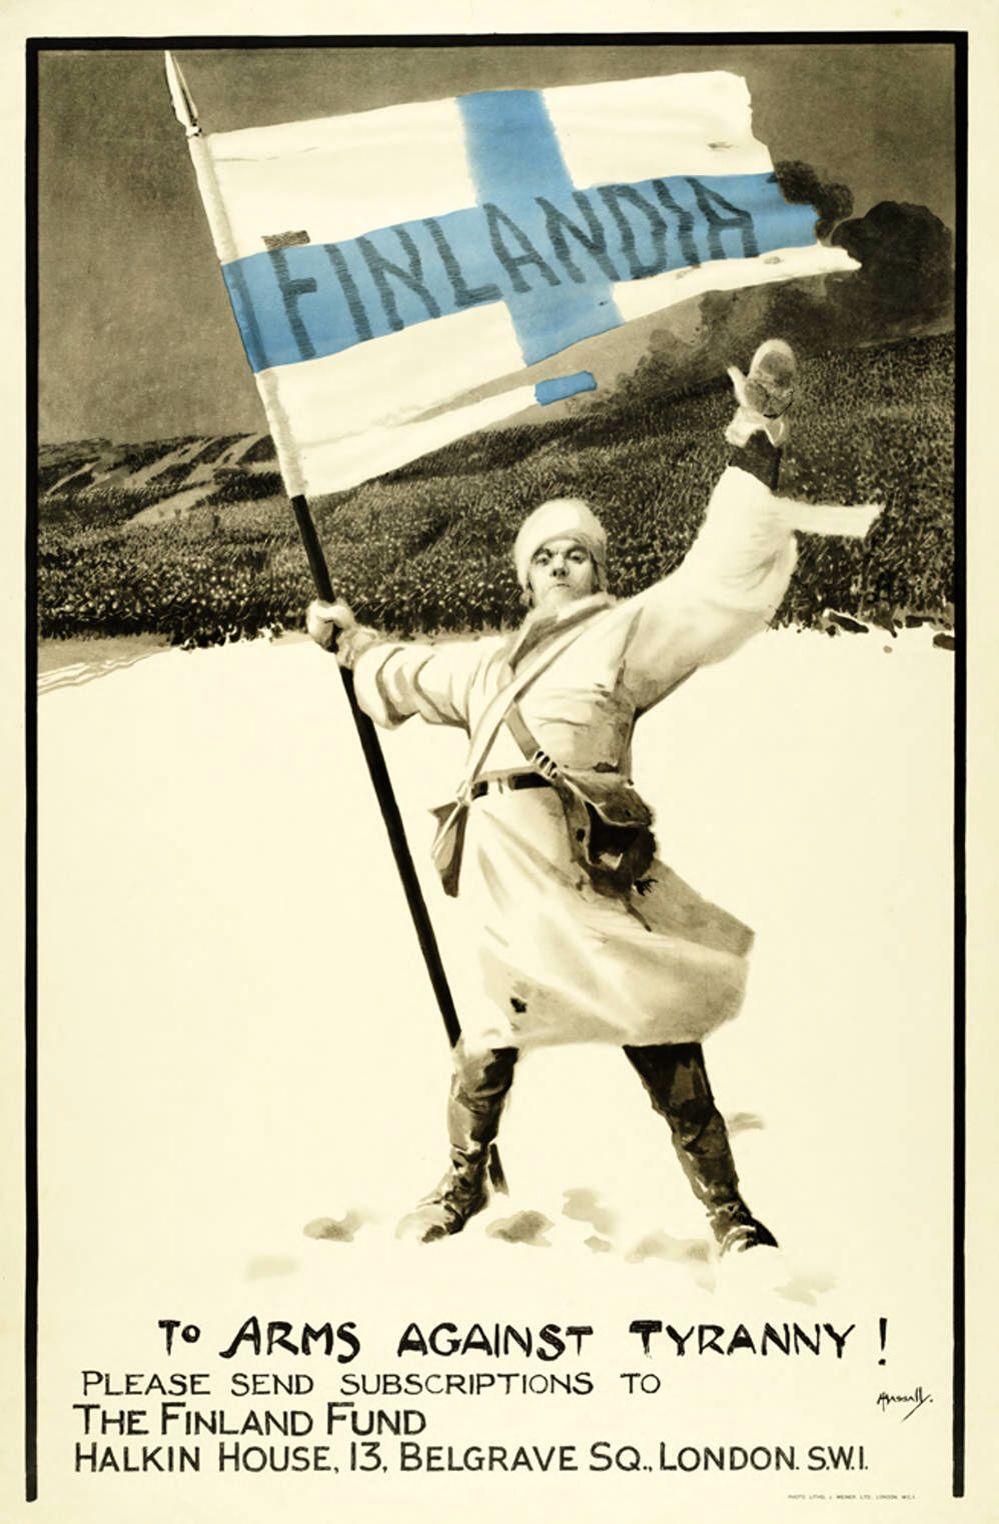 "Kuvahaun tulos: arms against tyranny finland"""